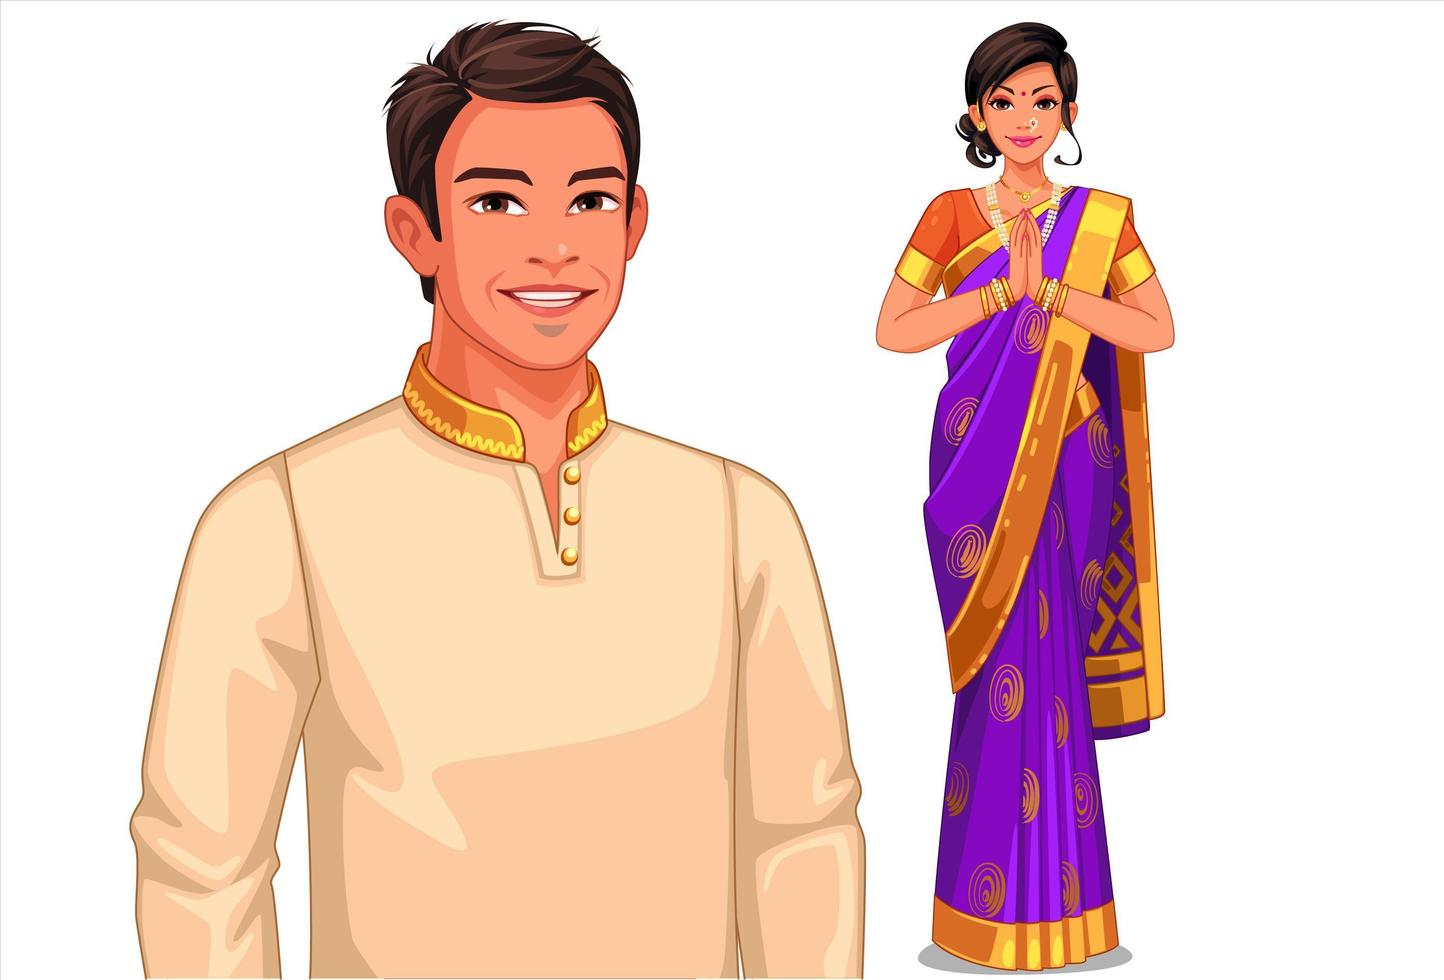 casal indiano em roupa tradicional vetor